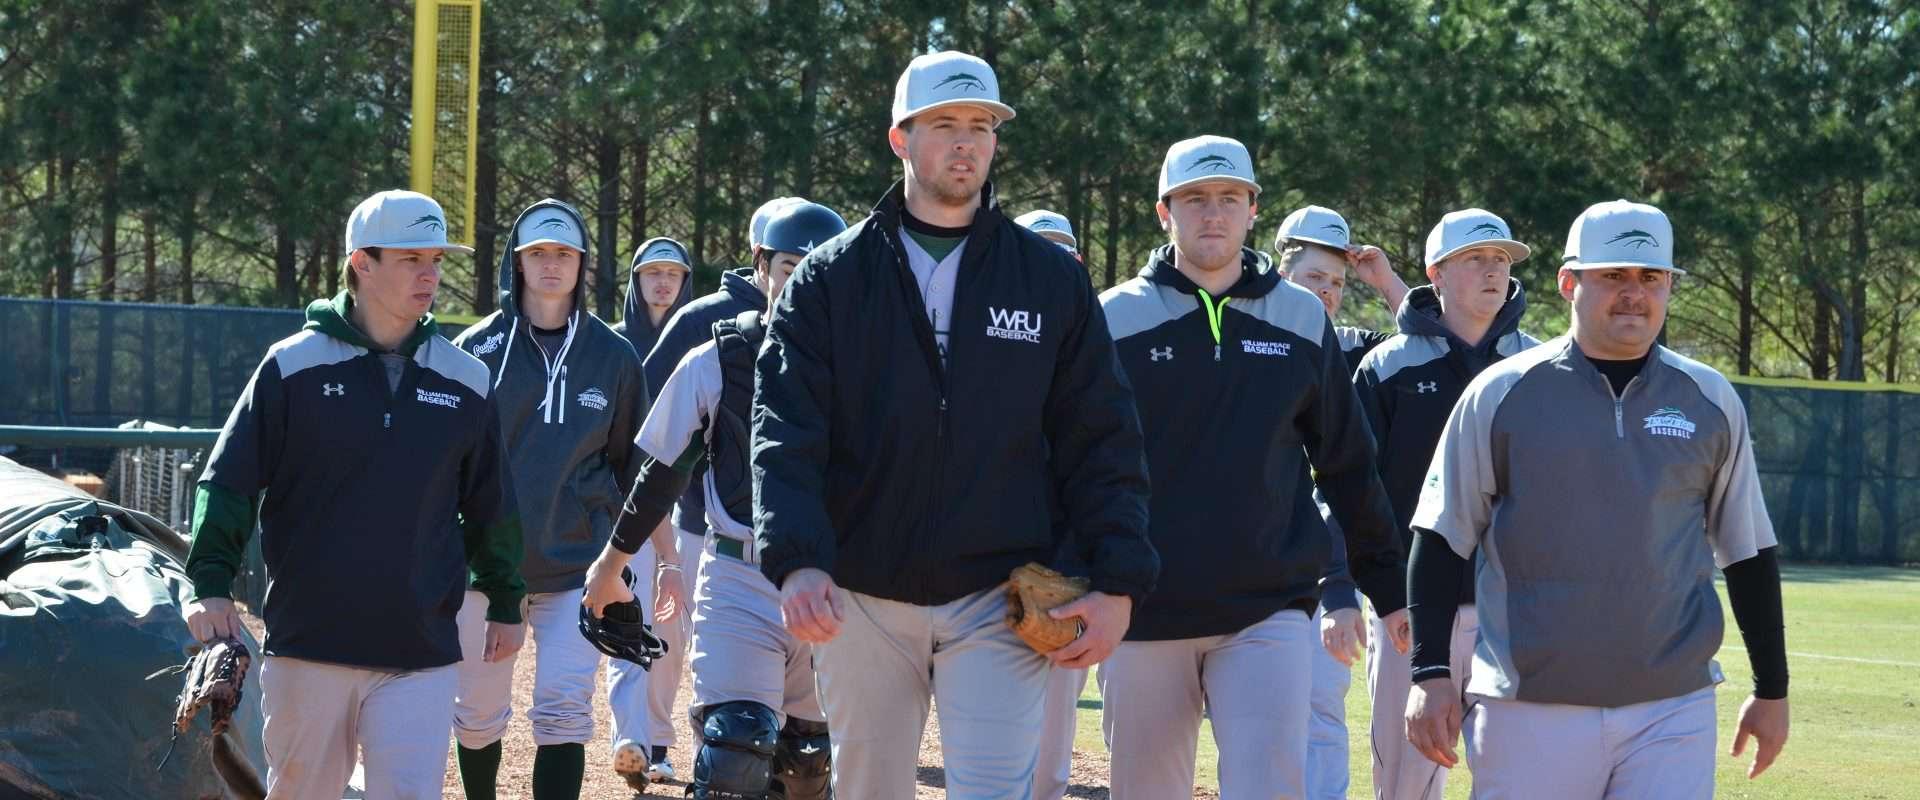 WPU to Host 2018 South Regional for NCAA DIII Baseball Tournament